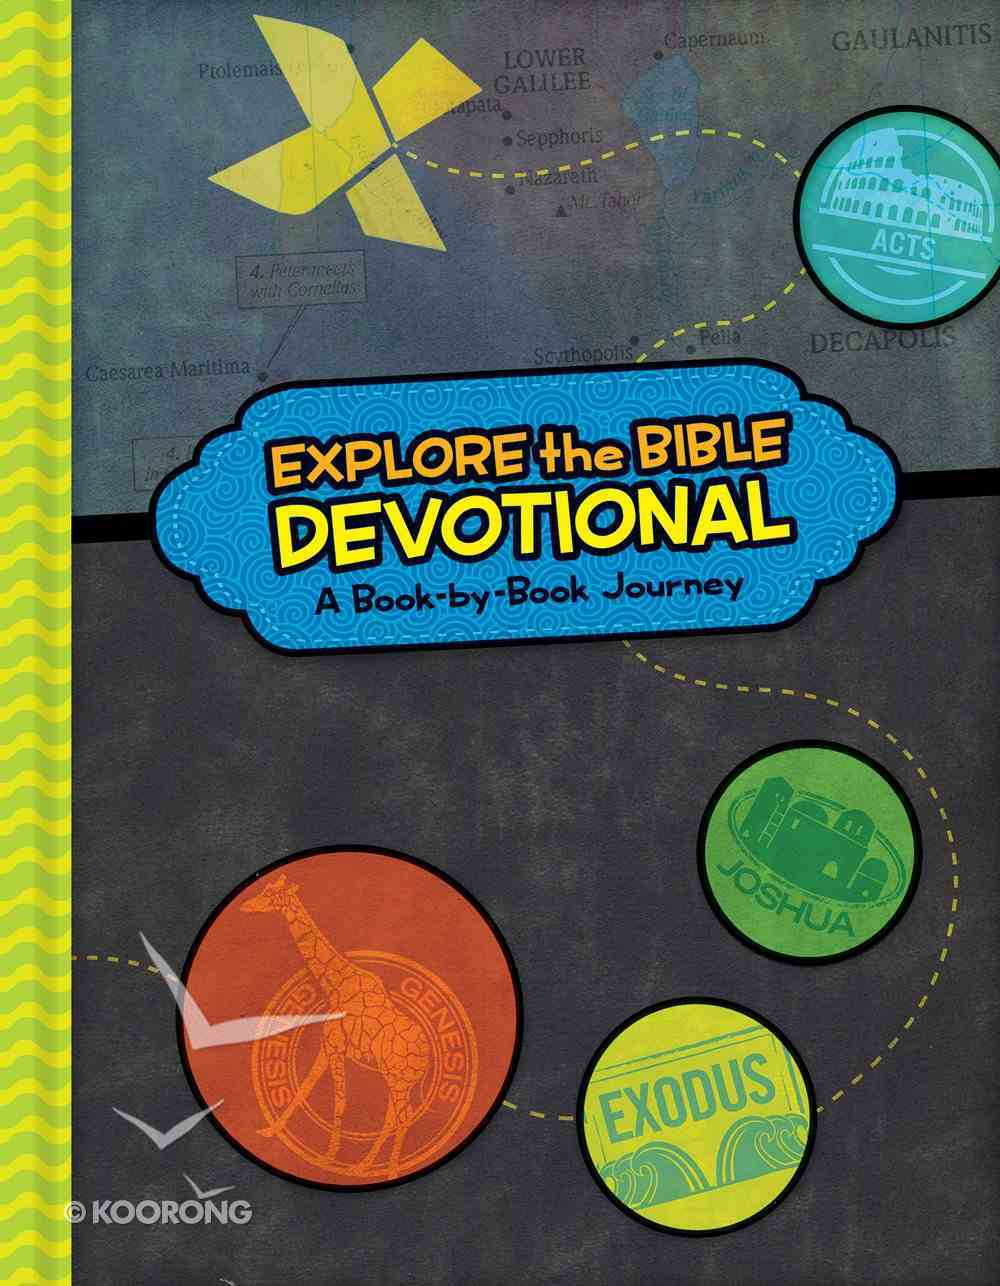 Explore the Bible Devotional, Epub (Explore The Bible Series) eBook